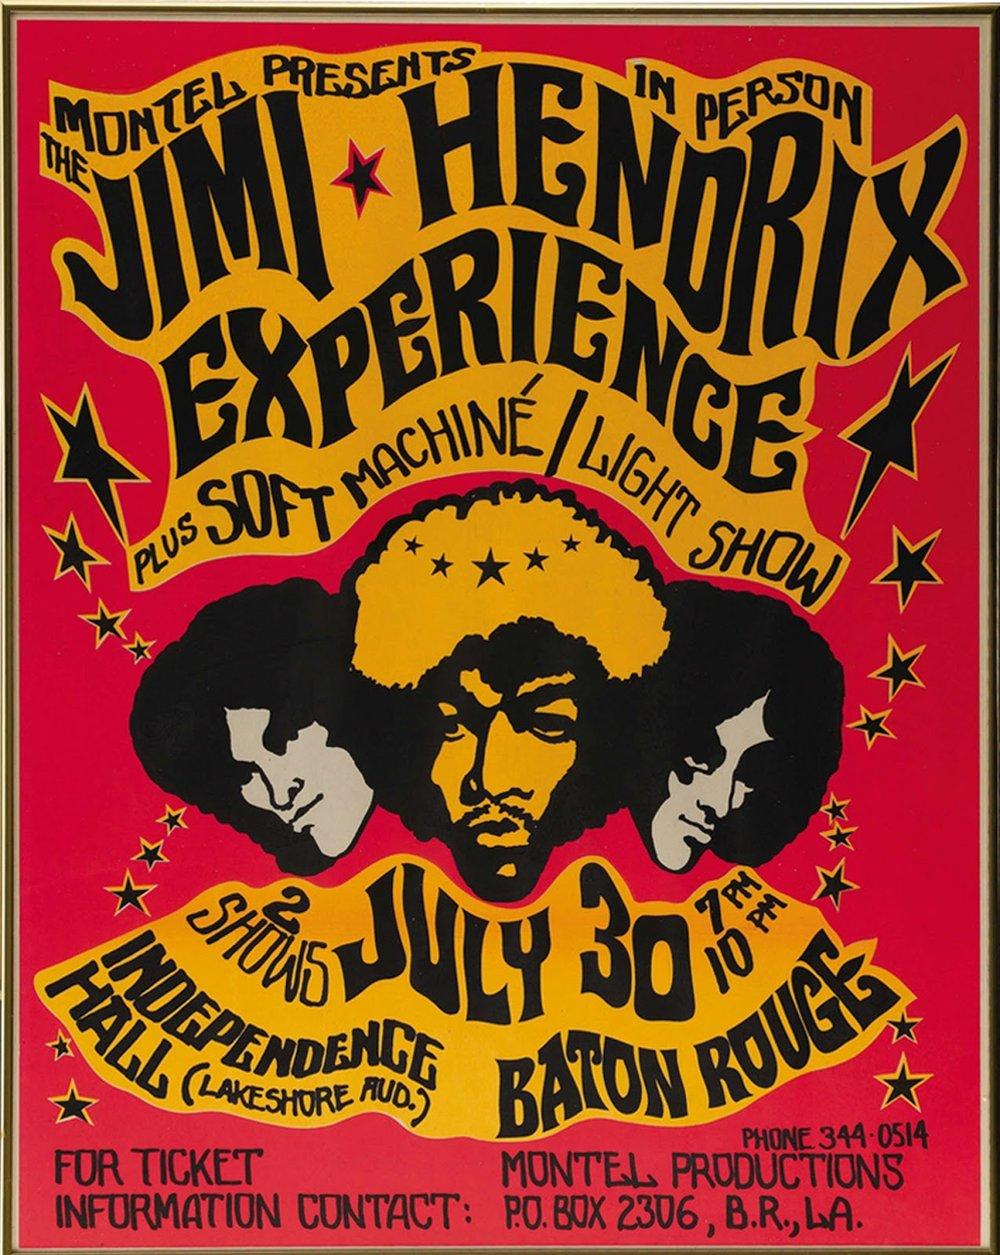 jimmy hendrix poster.jpg